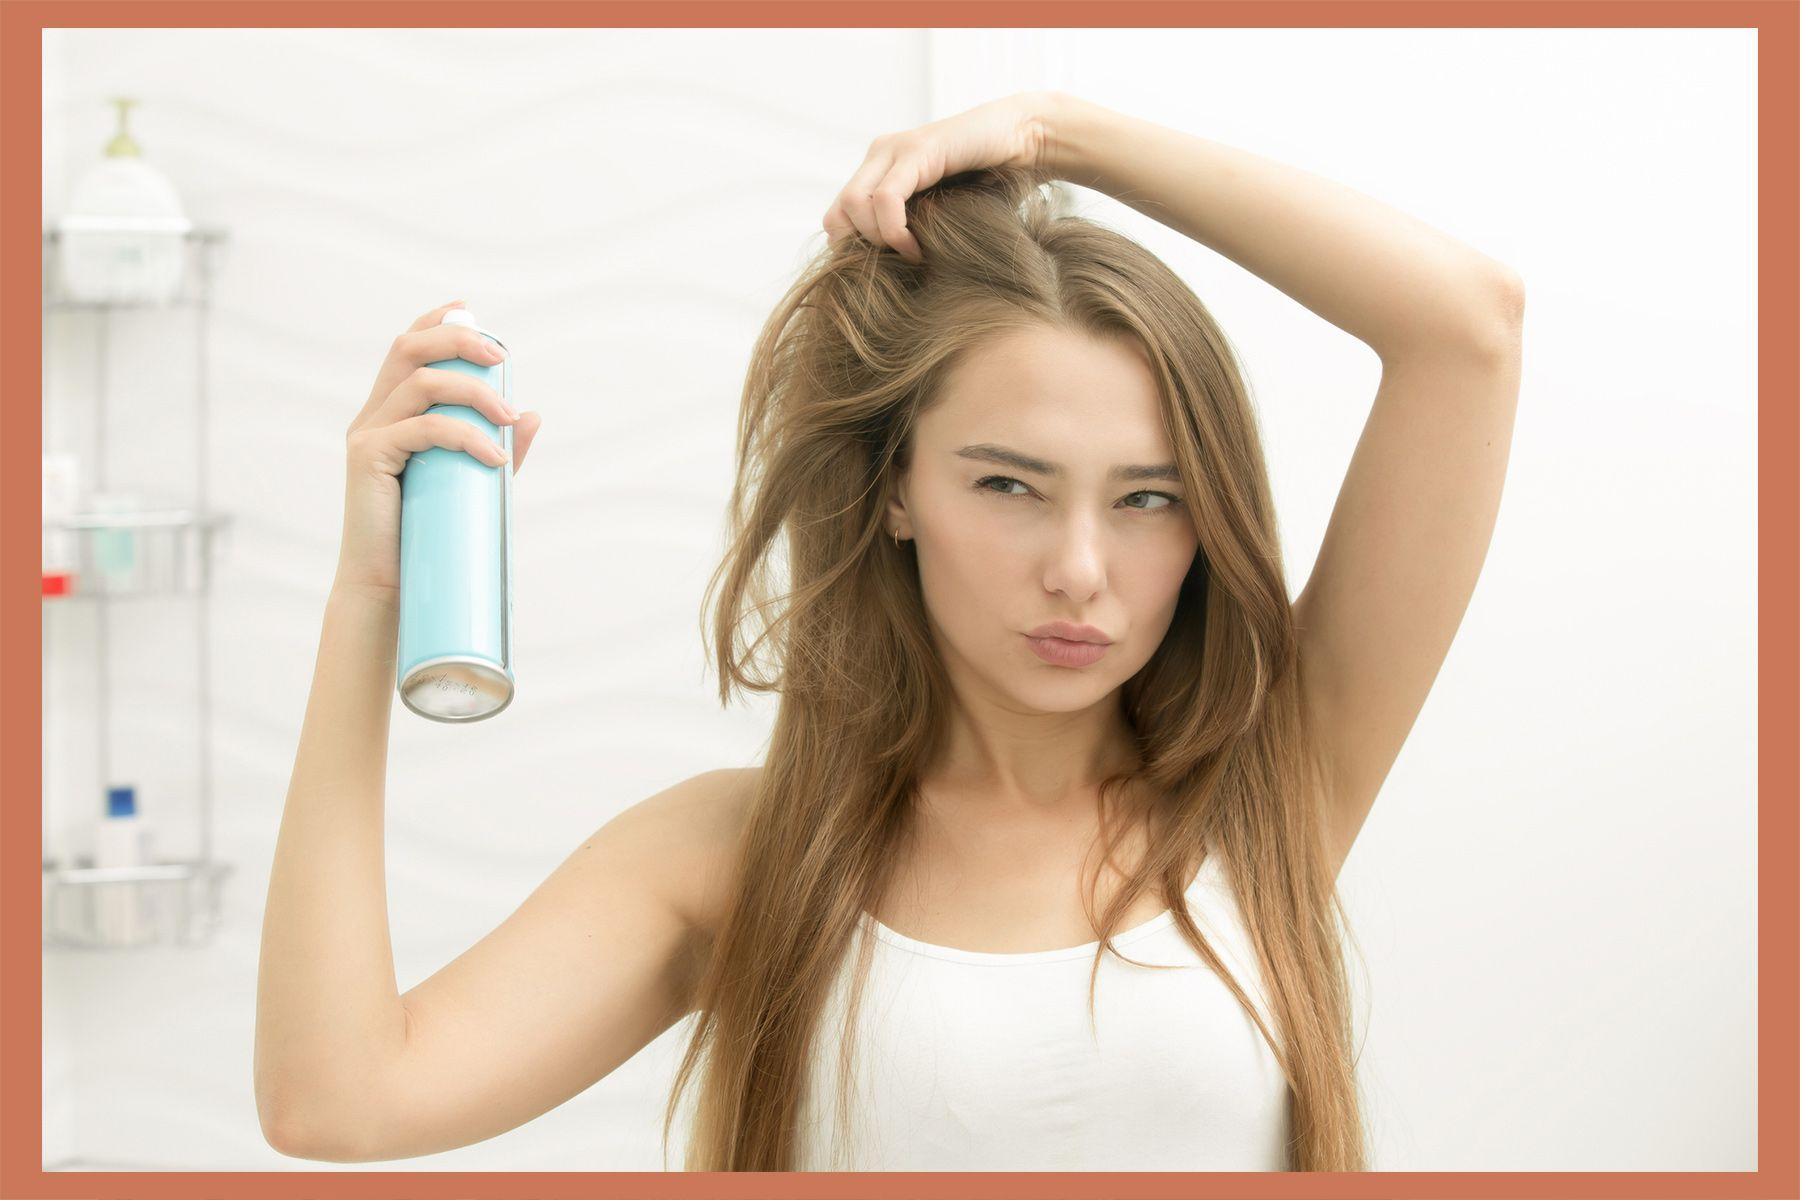 Pin By Cheri Charlton On Hair Hair Dry Shampoo Hair Loss Conditions